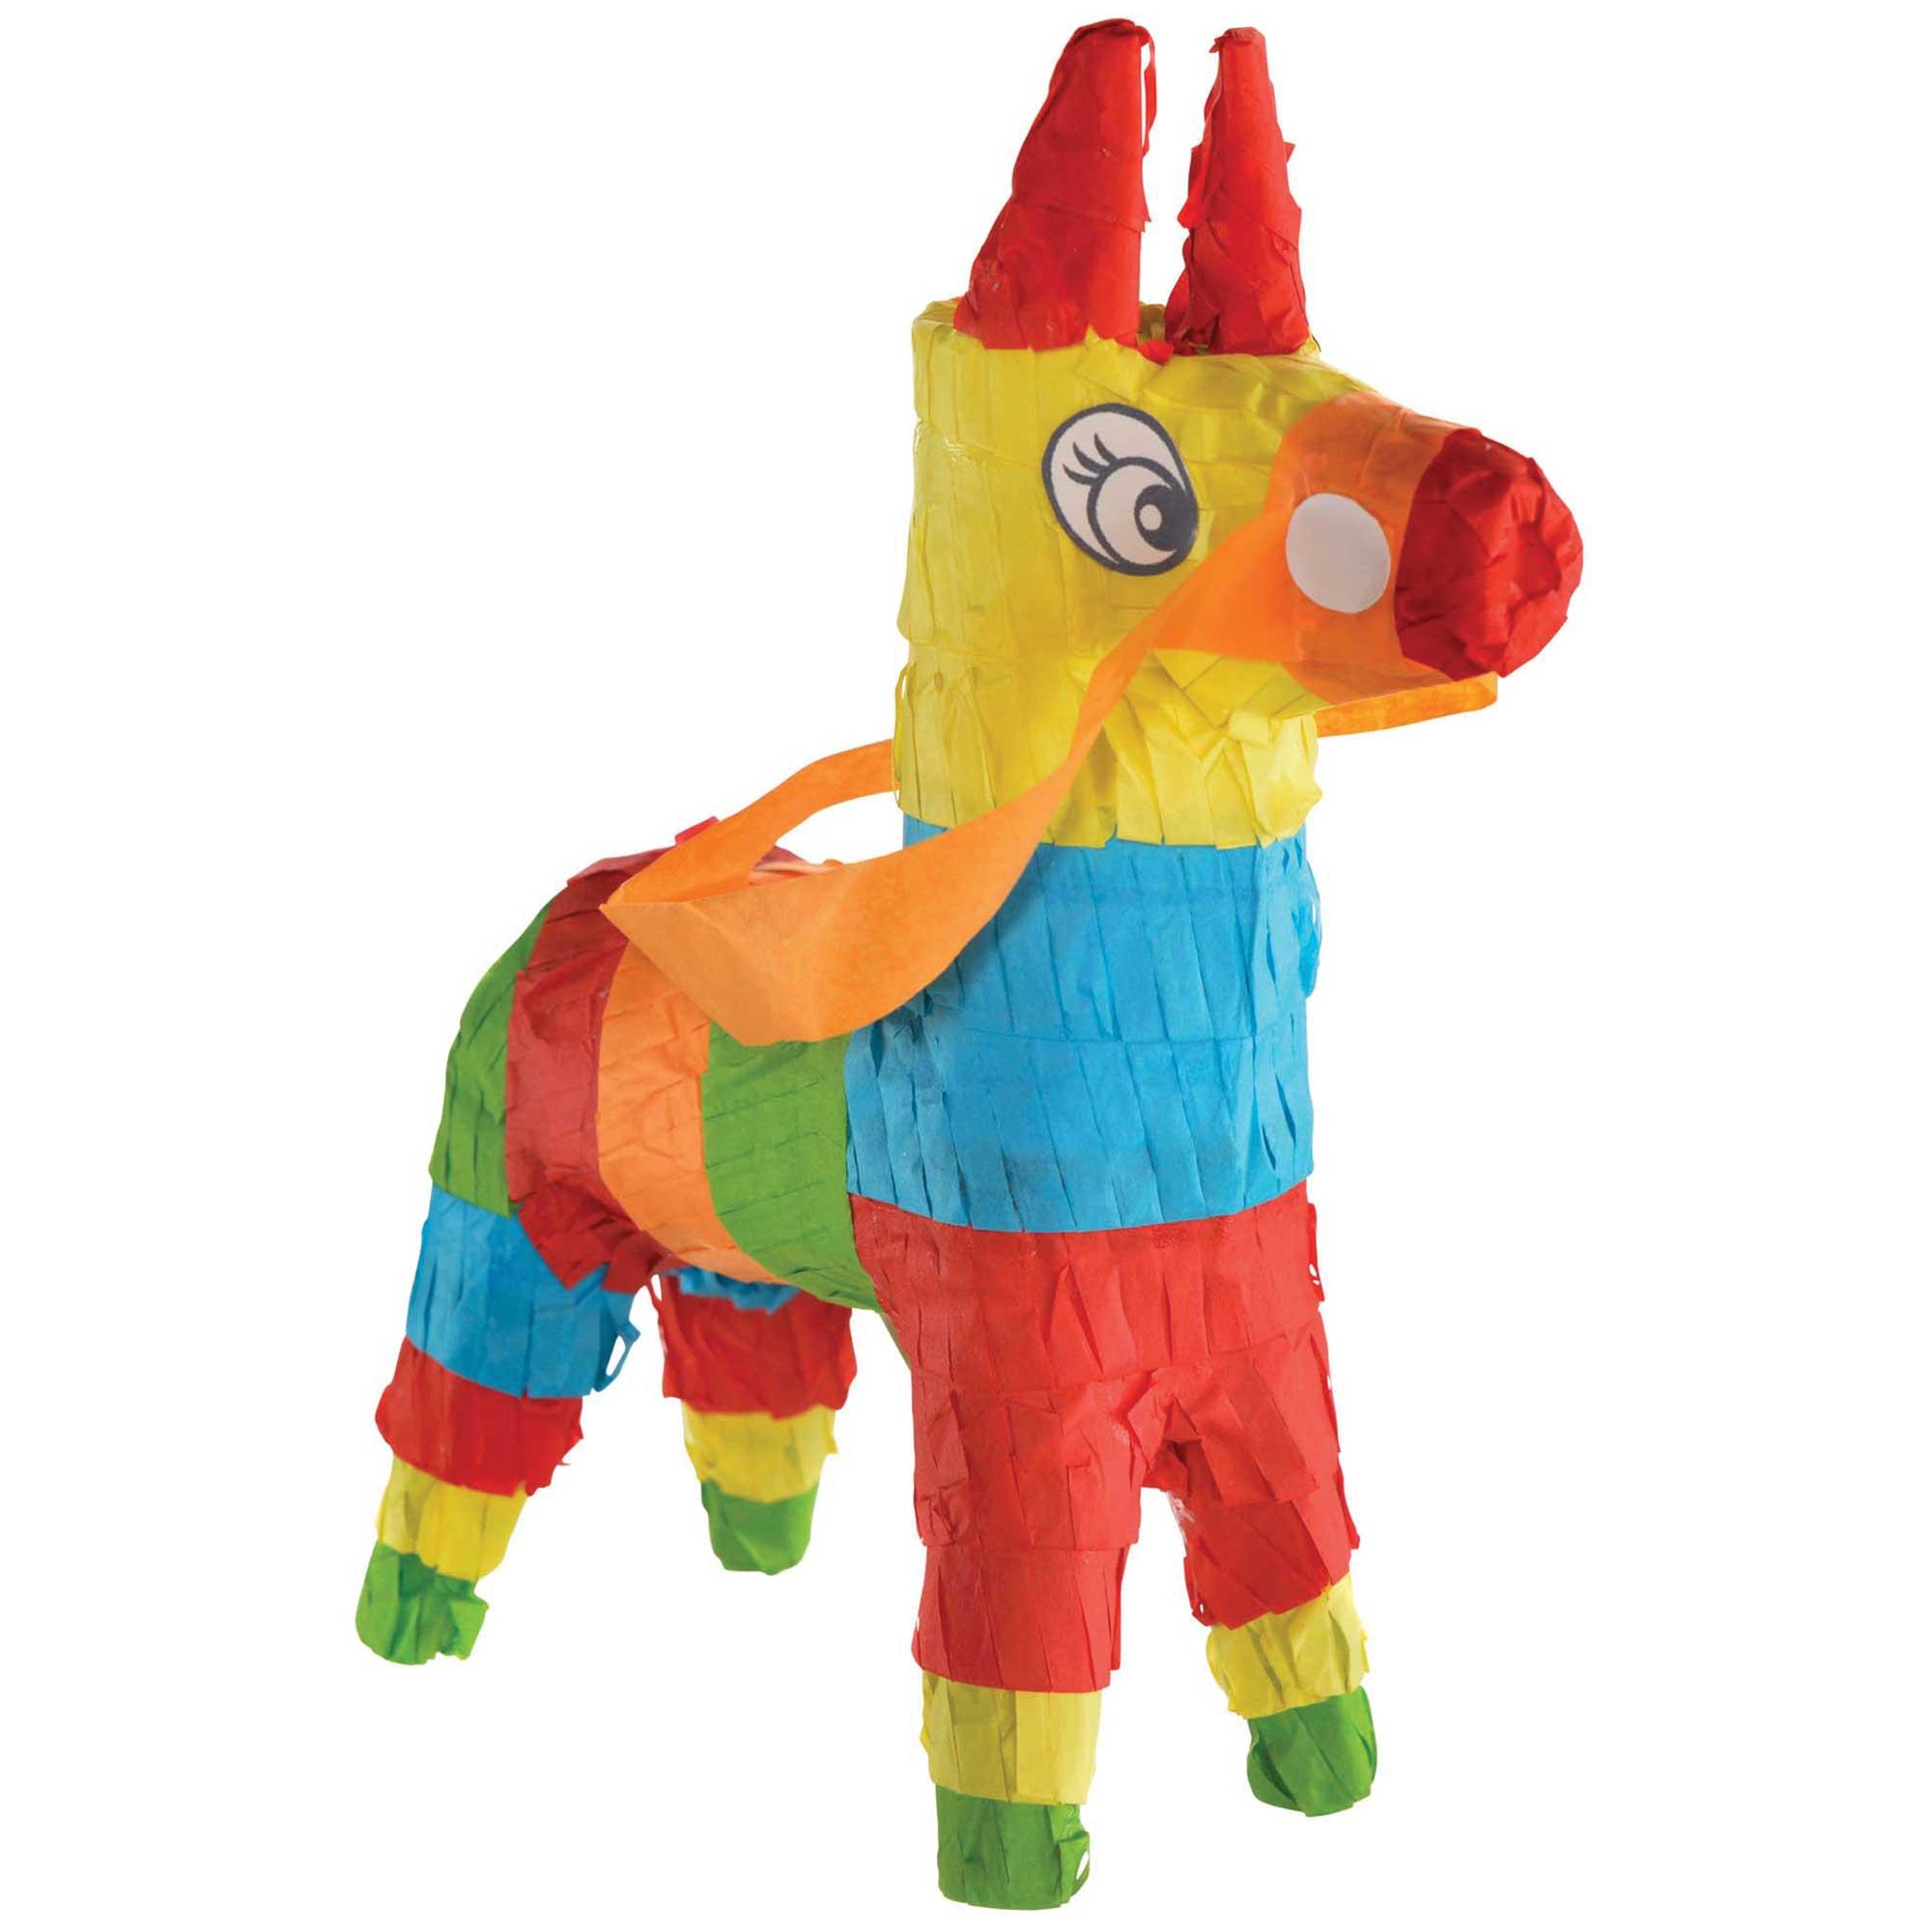 Fiesta Mini Donkey Pinata Decoration